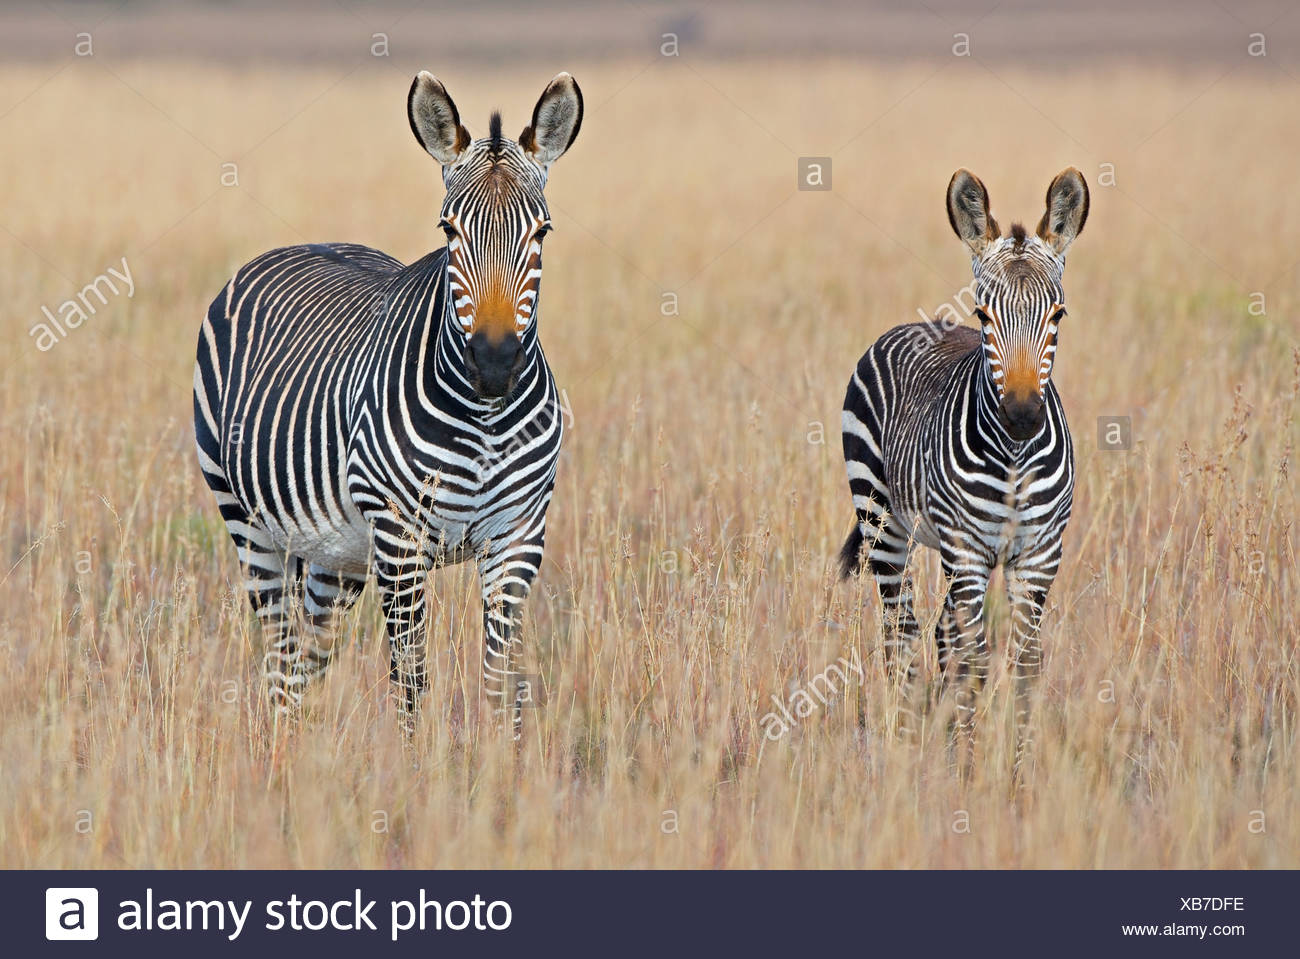 Le pianure zebra (Equus quagga) con il puledro in praterie, Mountain Zebra National Park, Eastern Cape Province, Sud Africa Immagini Stock